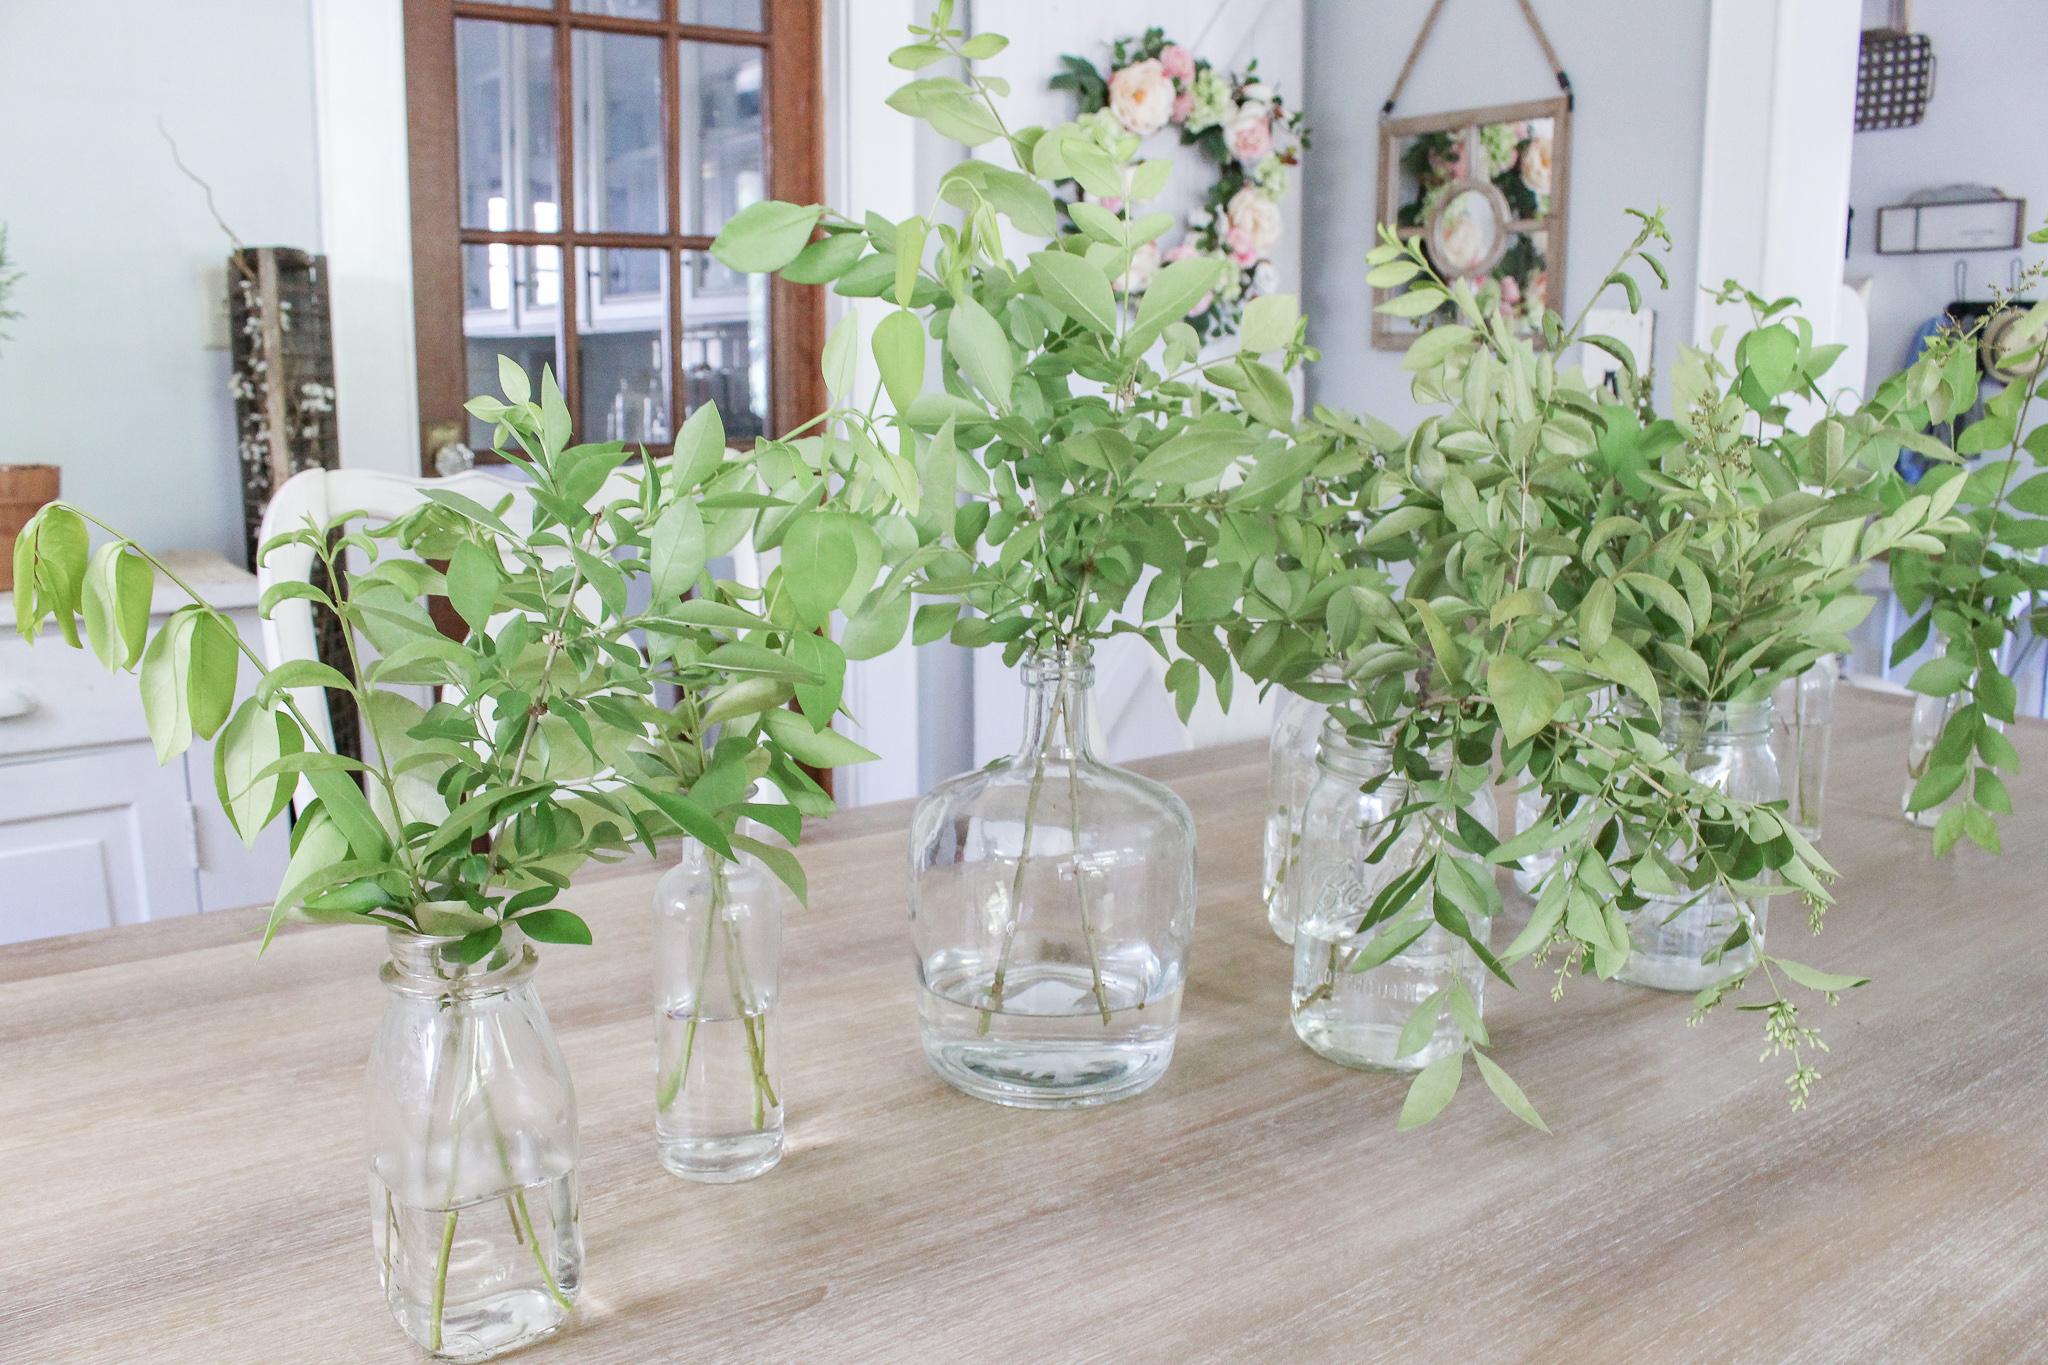 Dining room greenery